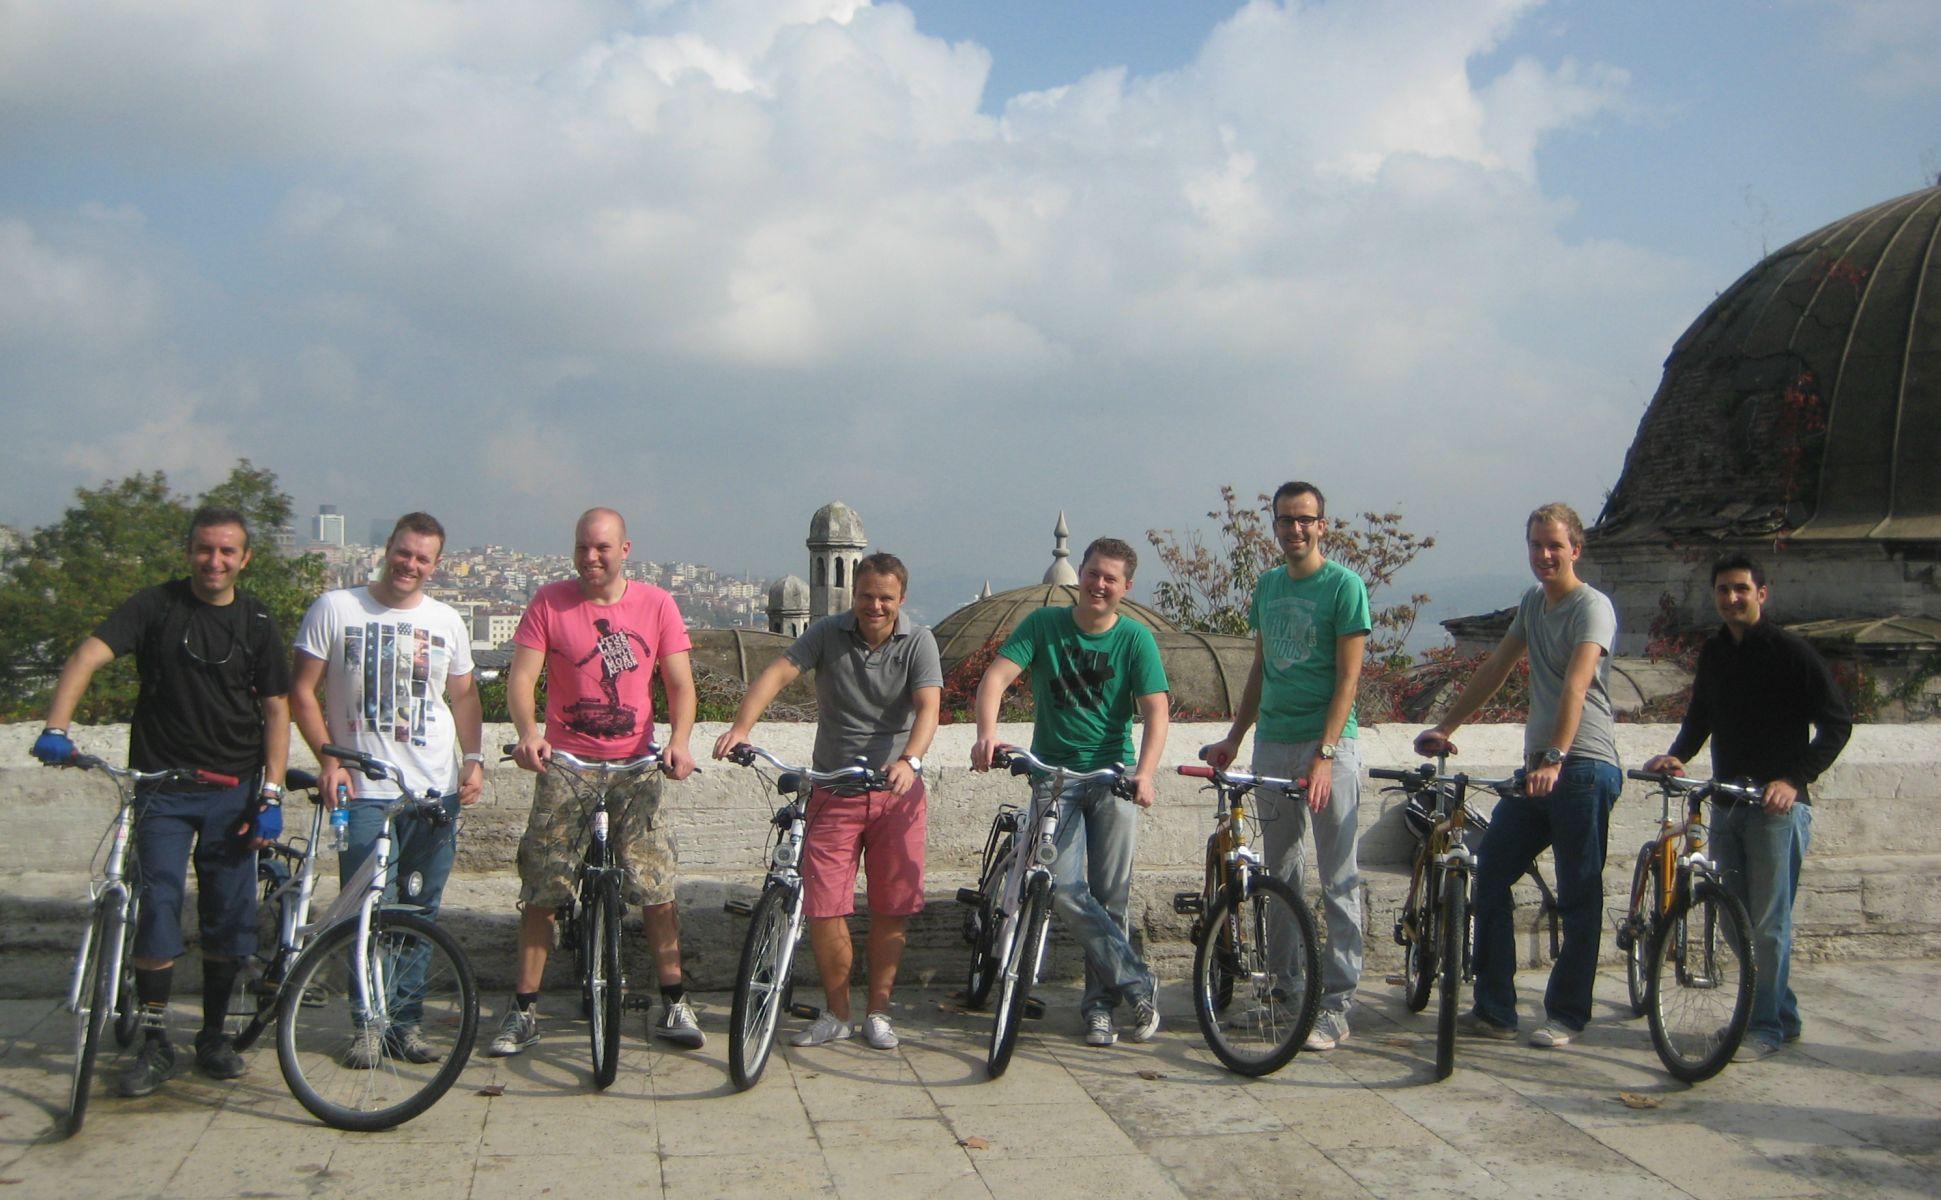 Group photo at Suleymaniye Mosque Old City Bike tour